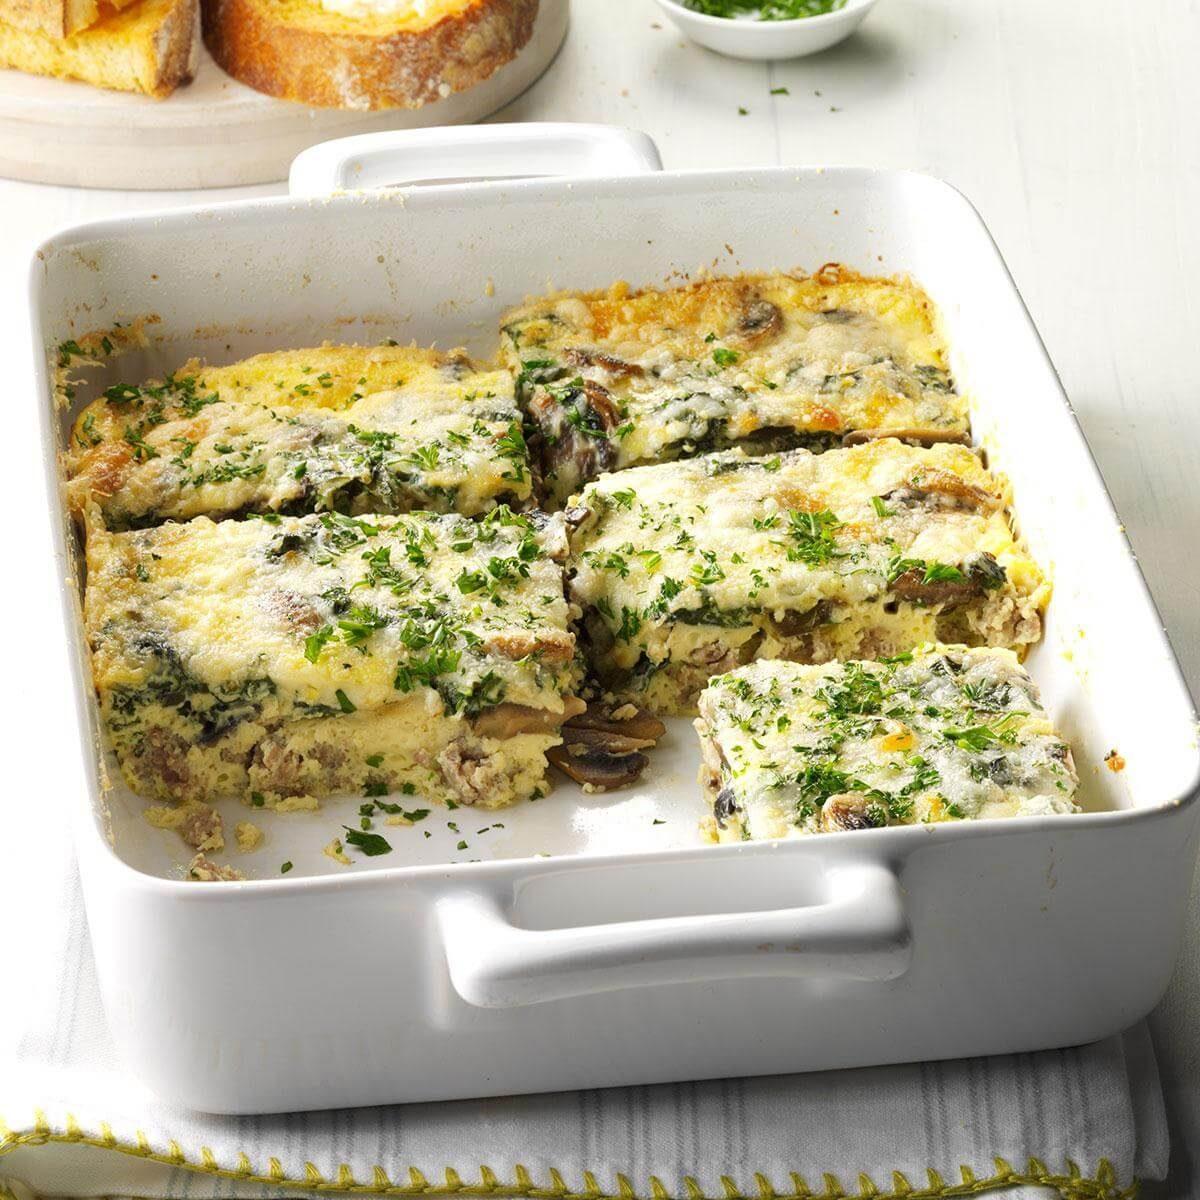 Sausage-Vegetable Egg Bake Recipe